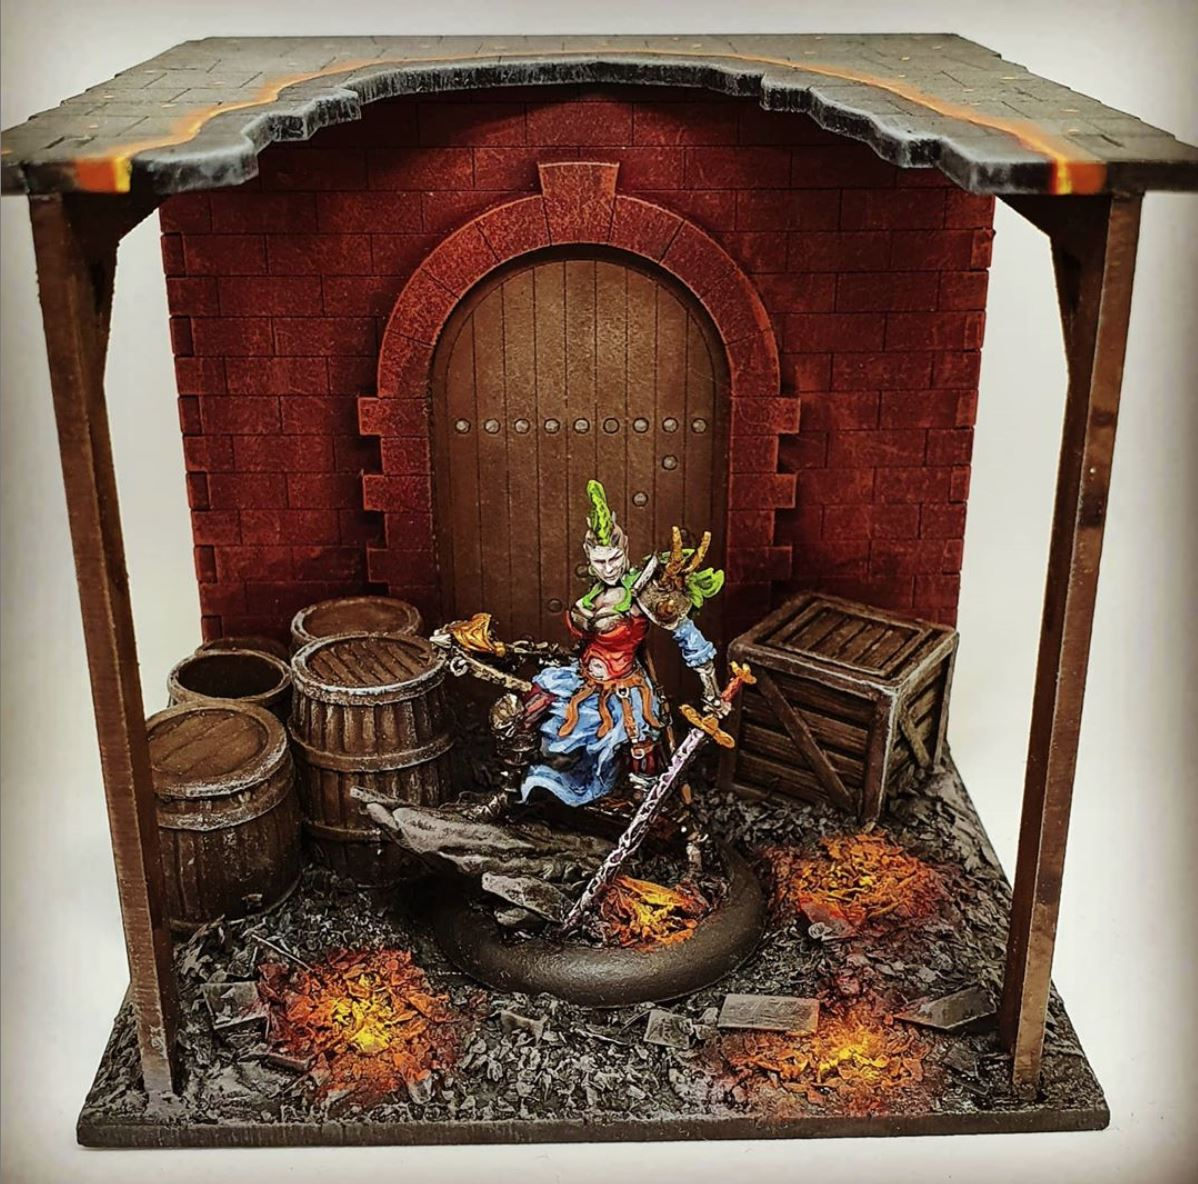 asset drop villains, zealot miniatures